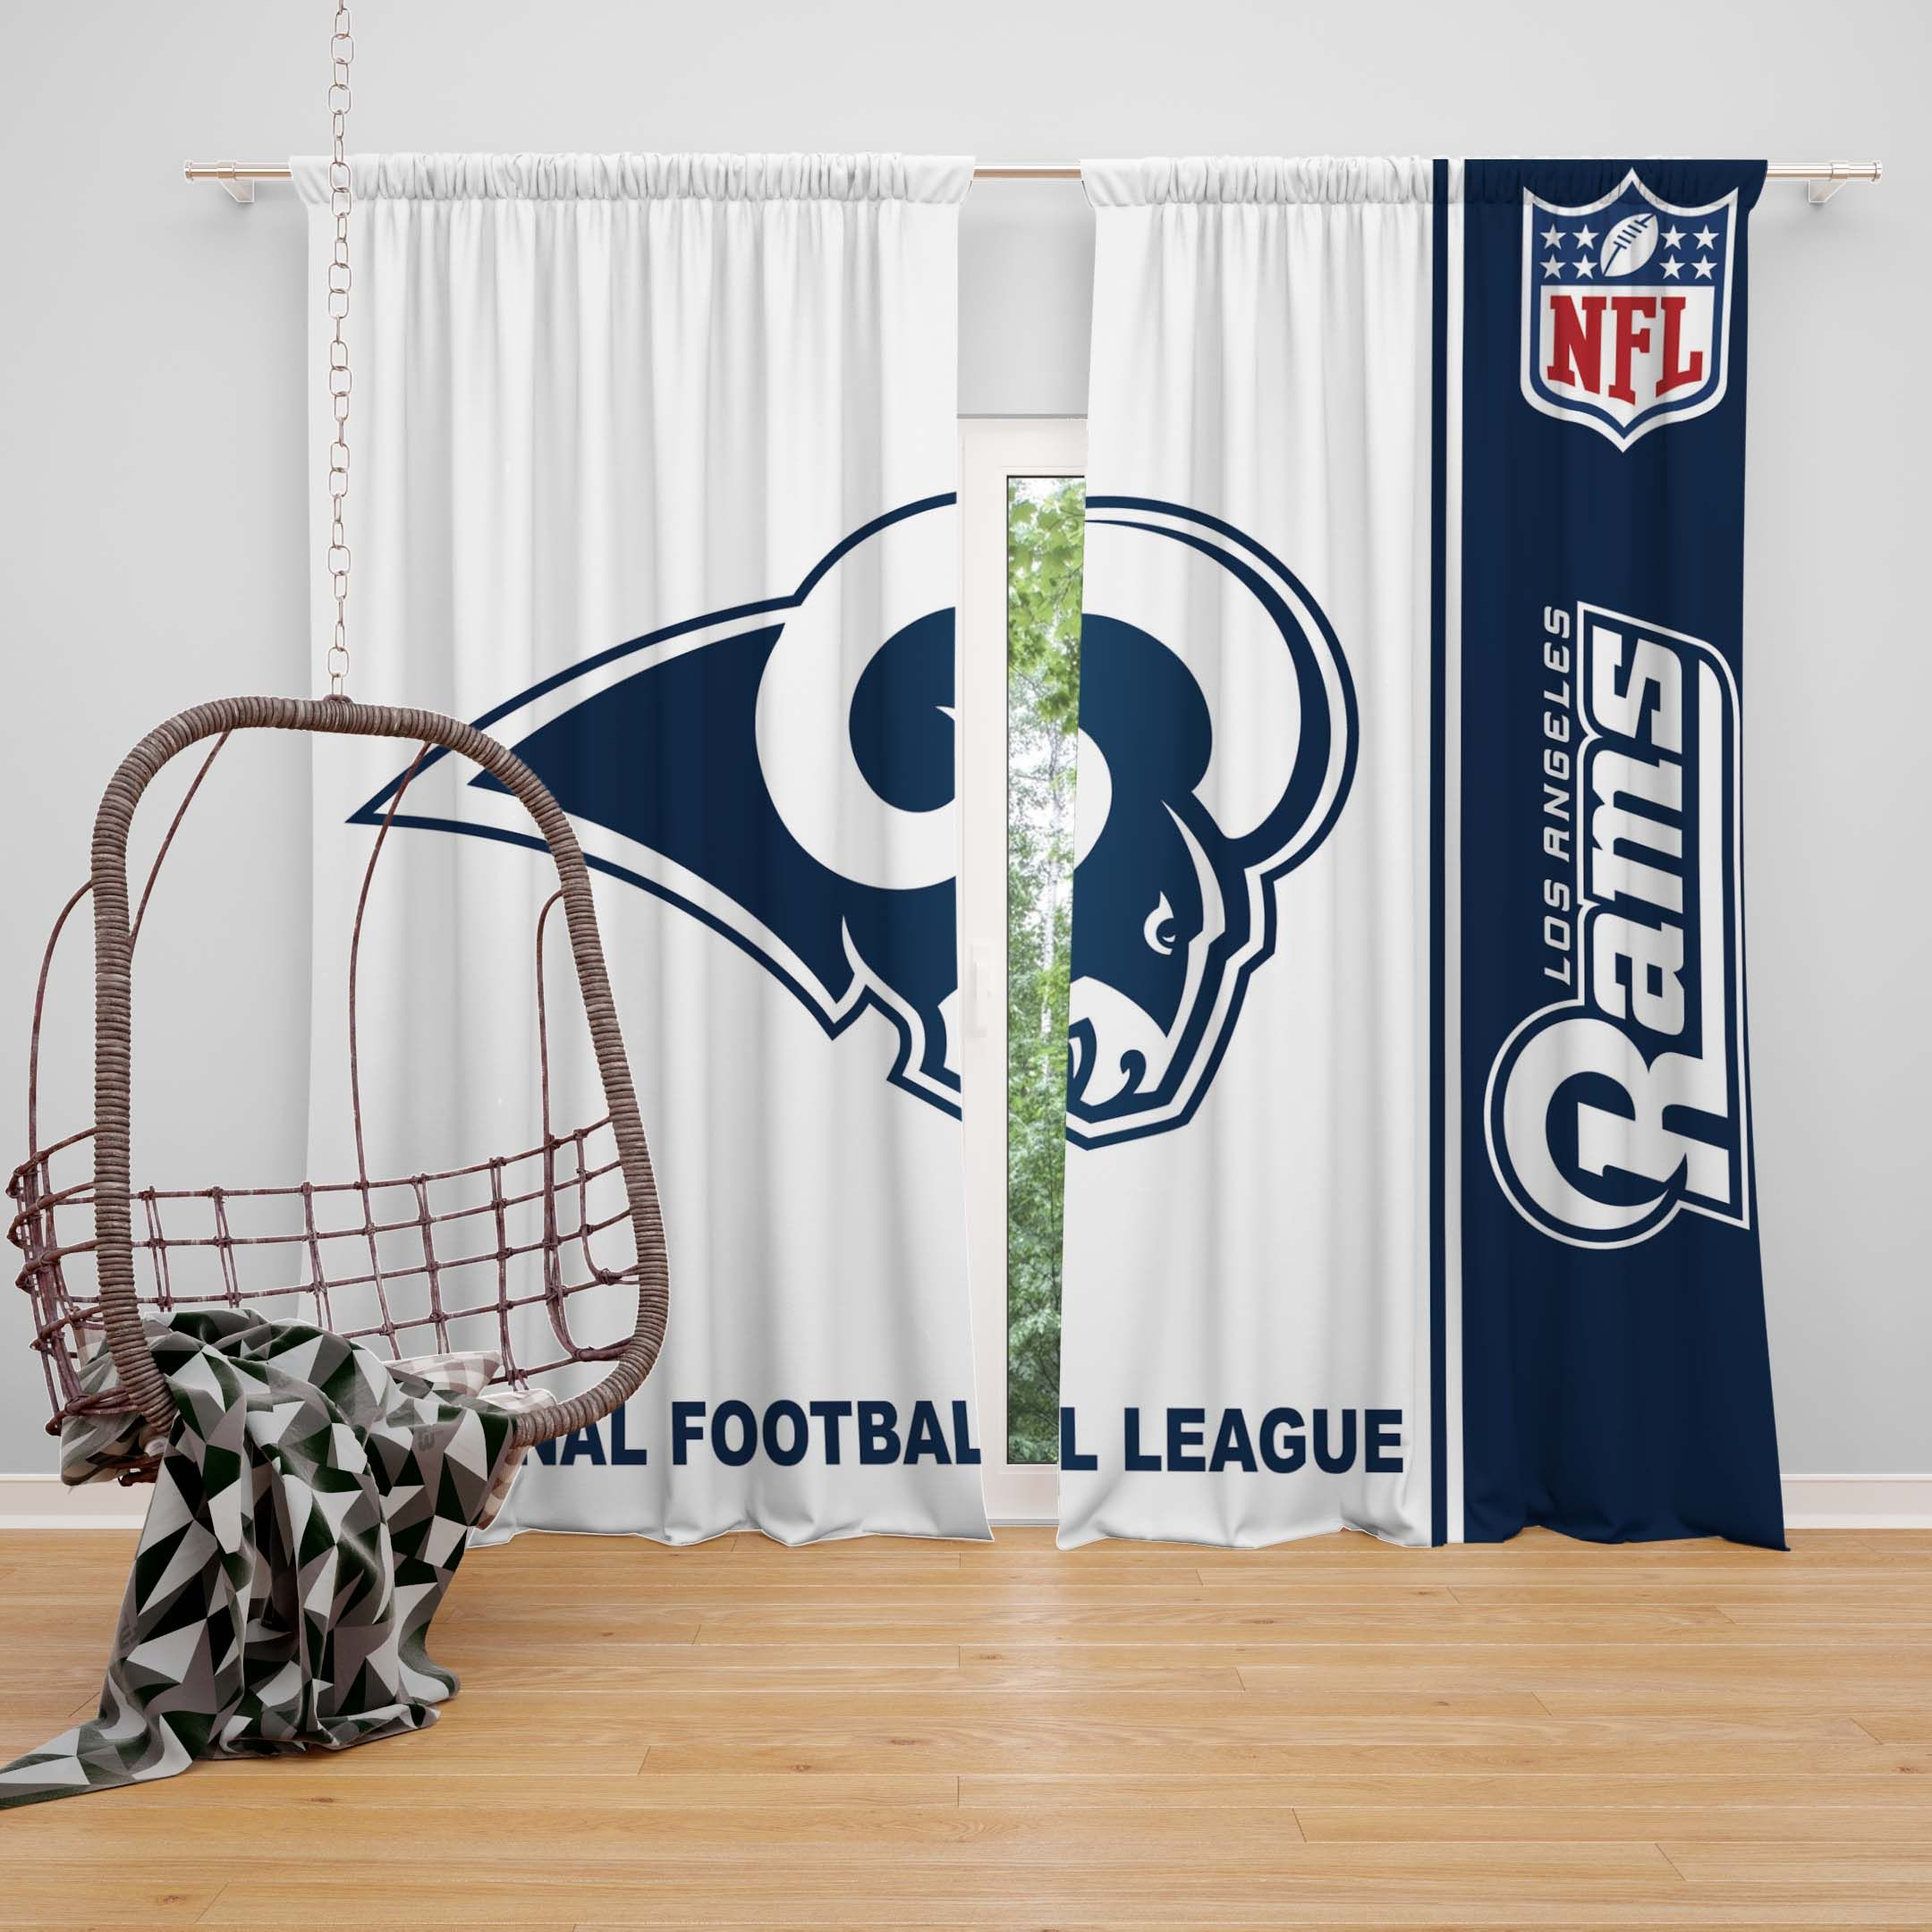 Nfl los angeles rams bedroom curtain nfl american football league